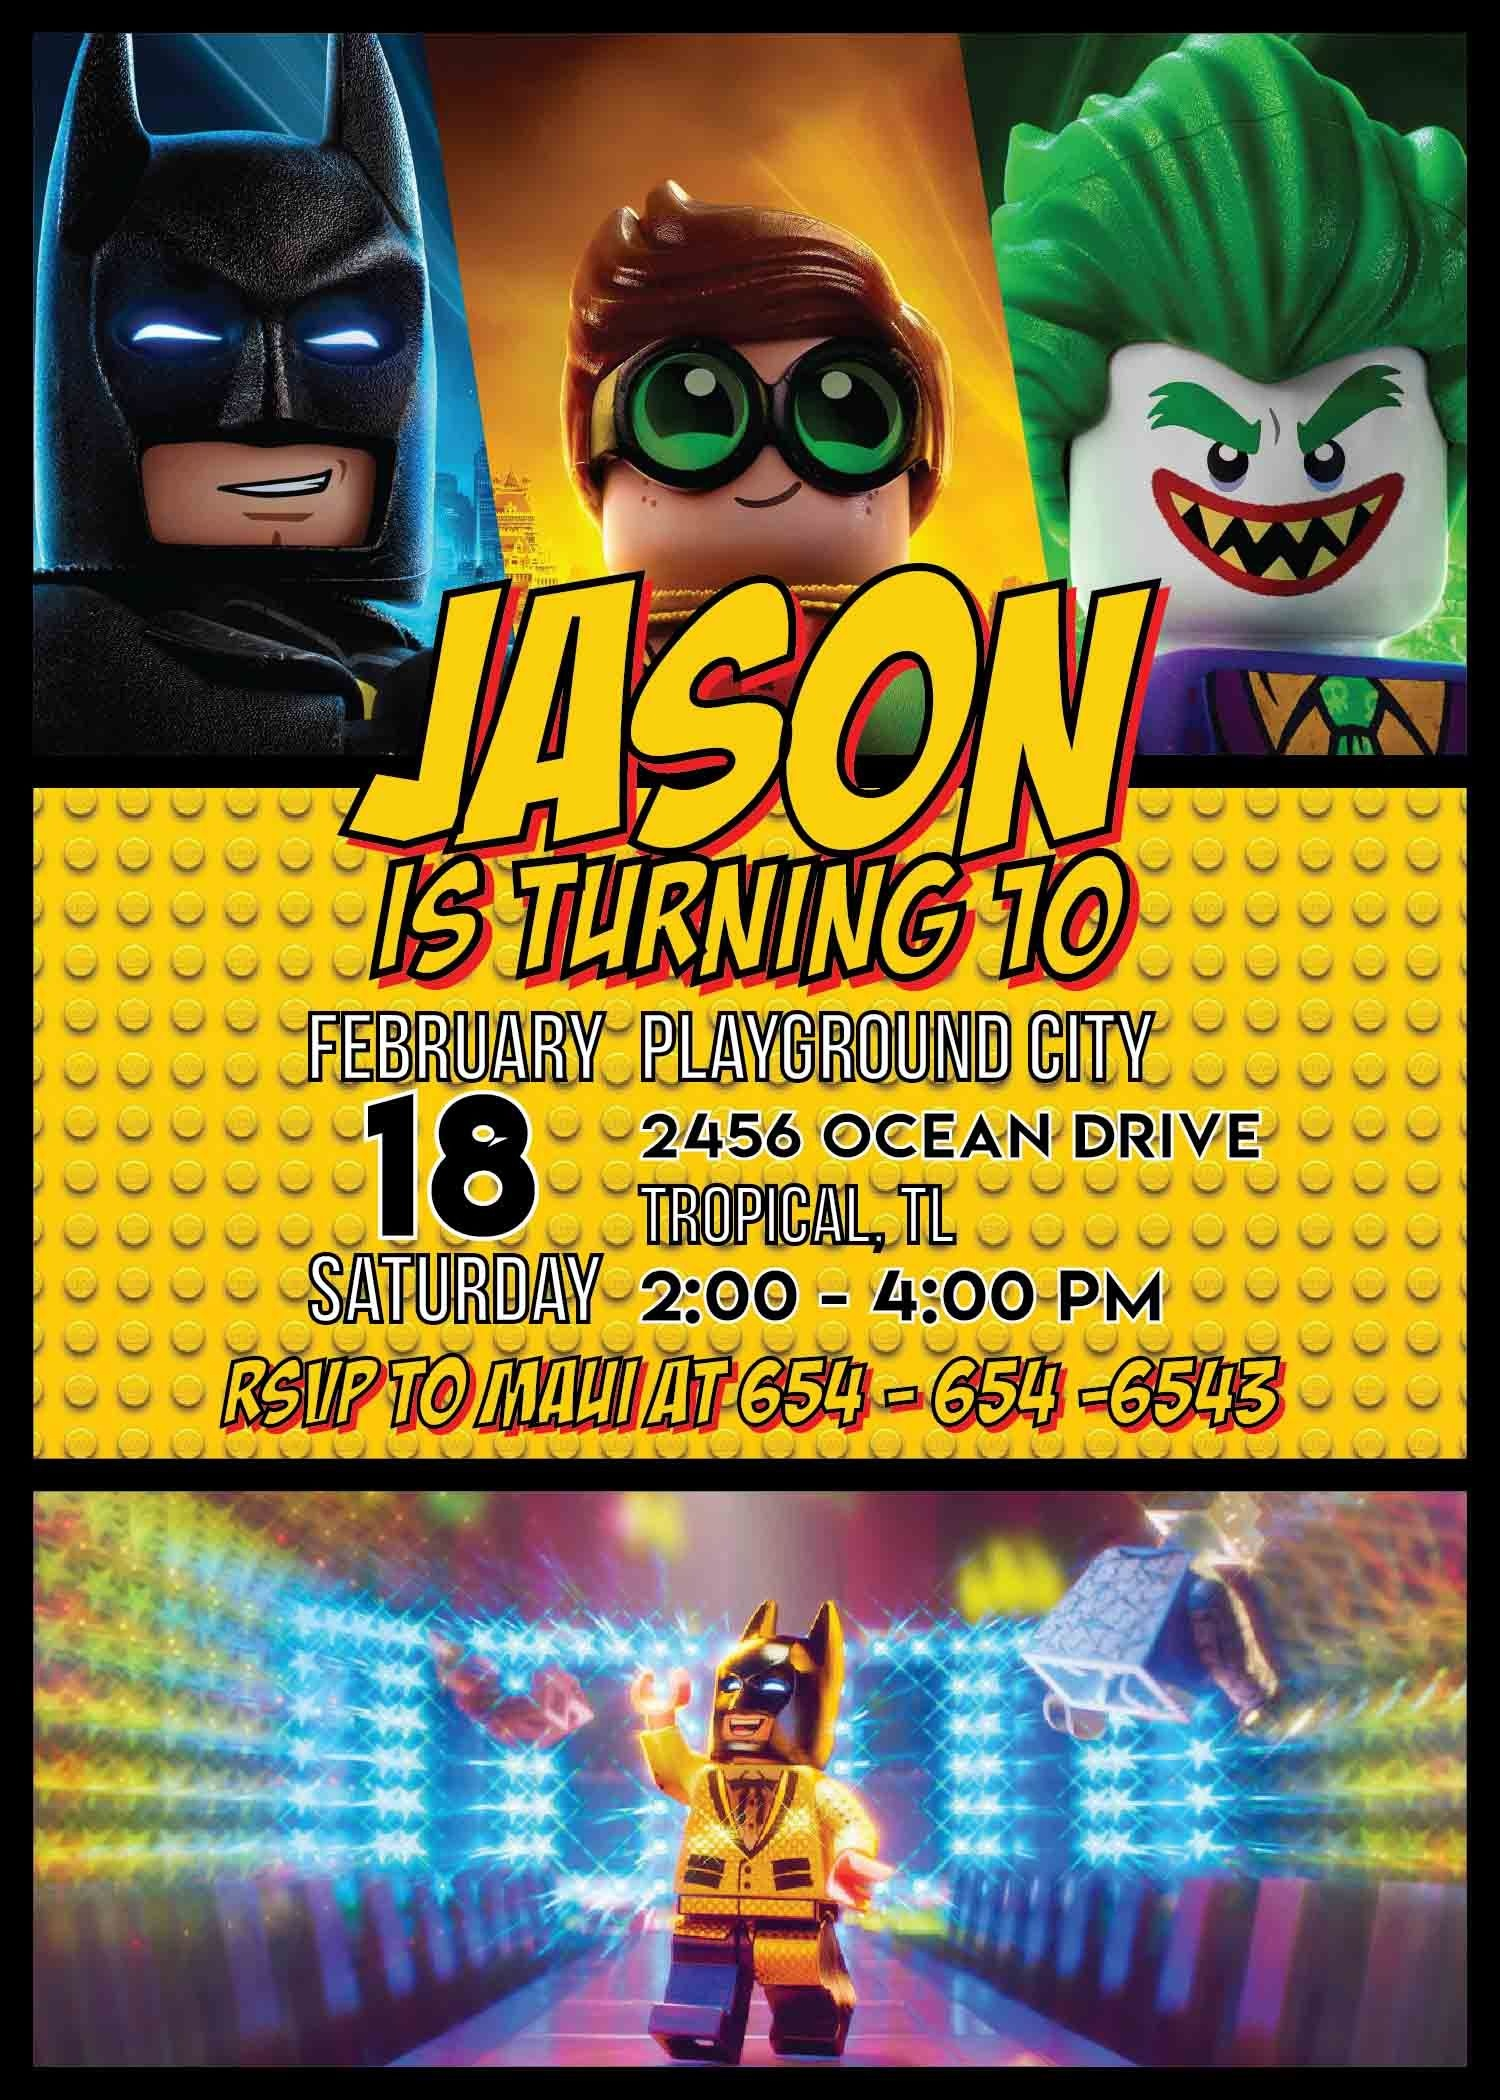 Lego Batman Party Invitation Template In 2019 | Lego Batman Party - Lego Batman Party Invitations Free Printable